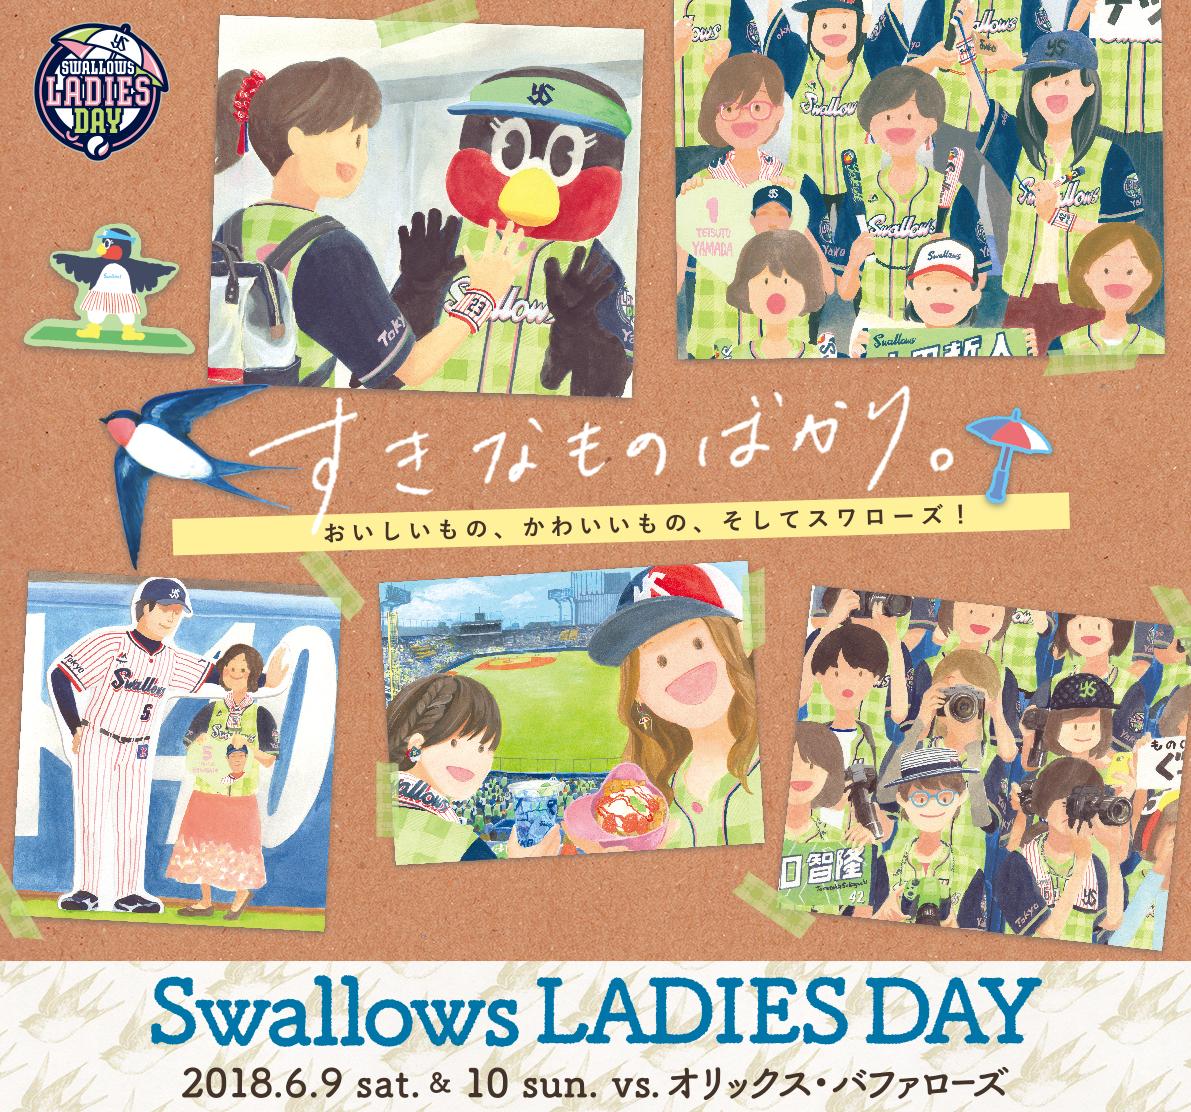 Swallows Ladies Day 2018 東京ヤクルトスワローズ 東京 東京